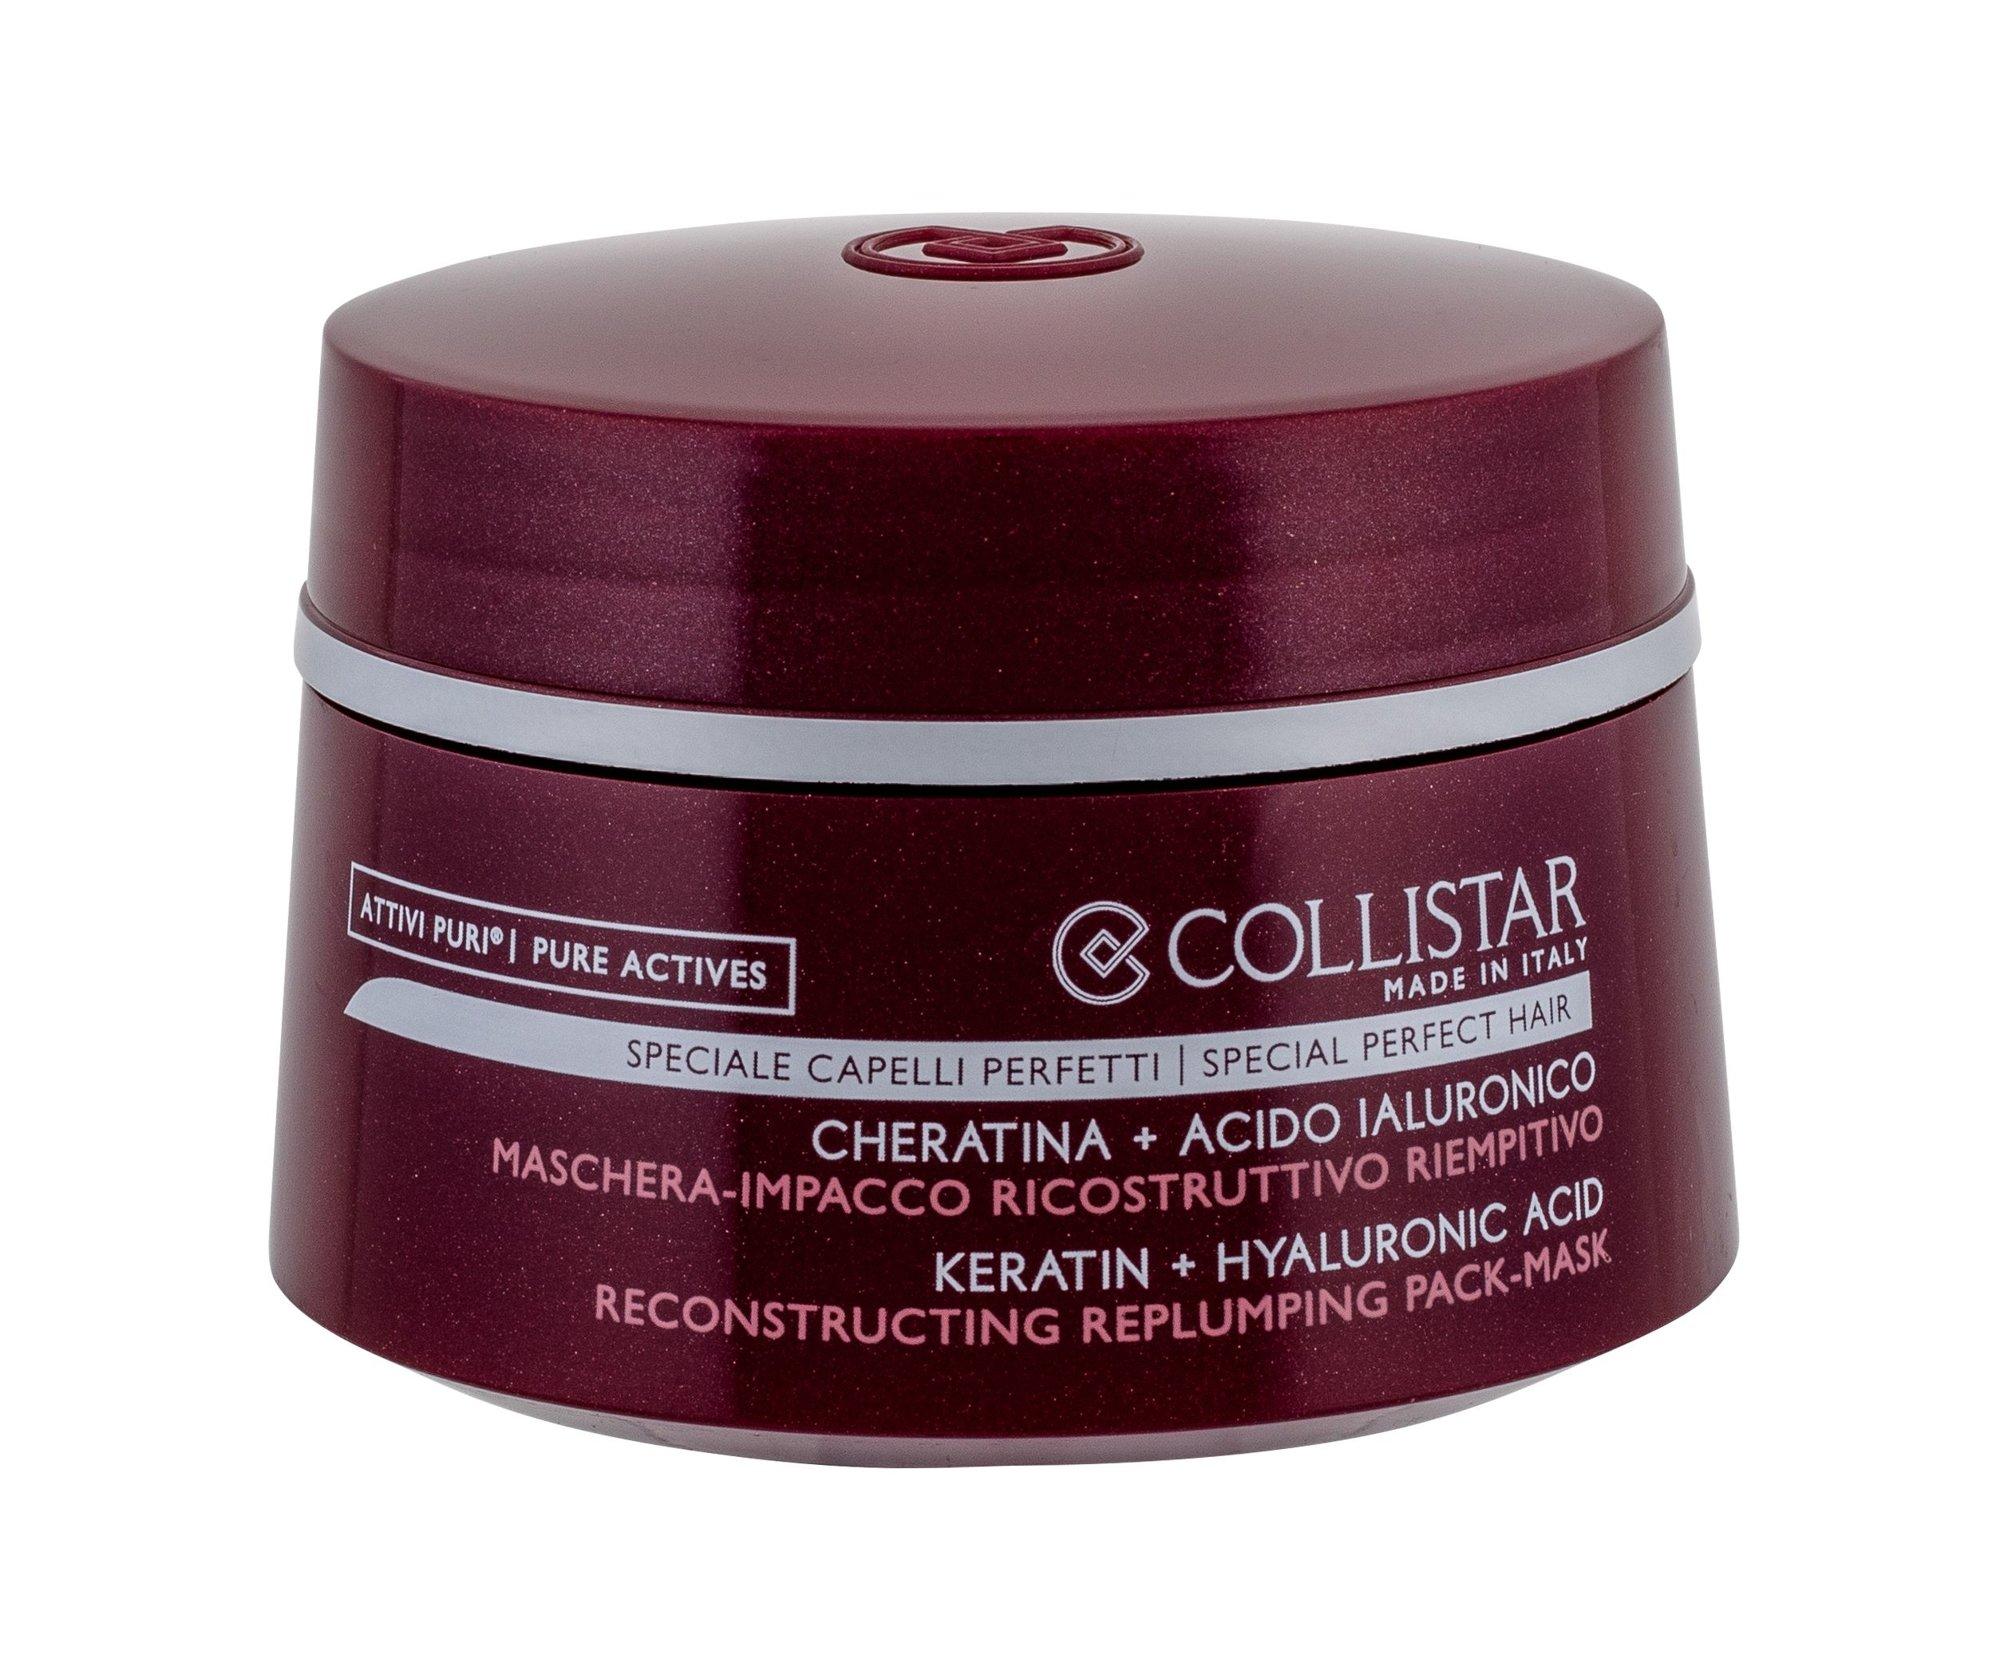 Collistar Pure Actives Hair Mask 200ml